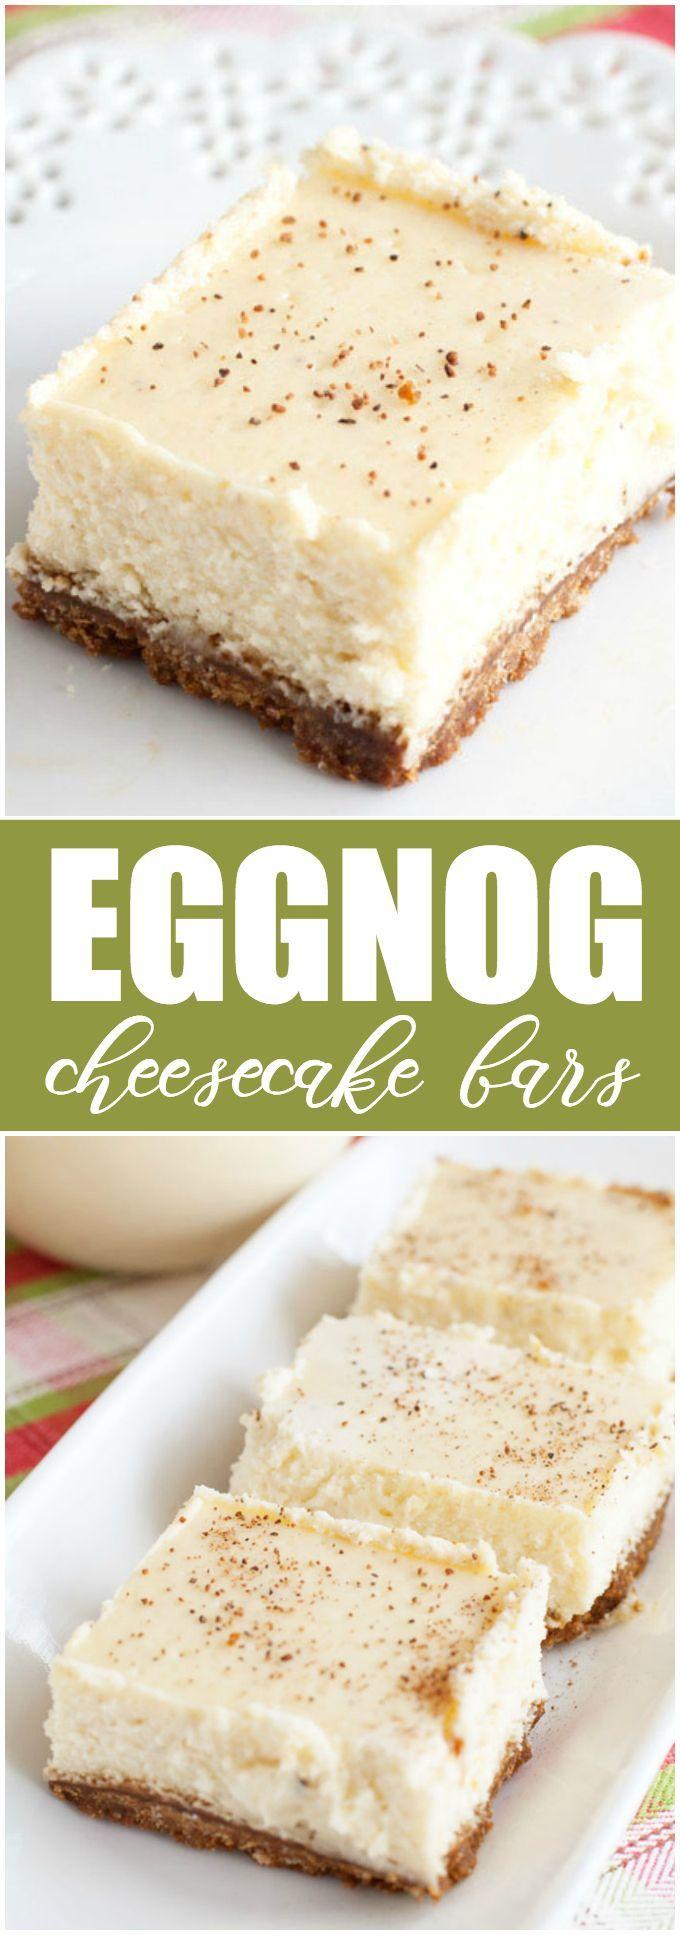 Eggnog Cheesecake Bars - Creamy rich eggnog cheesecake with a spicy gingersnap cookie crust.